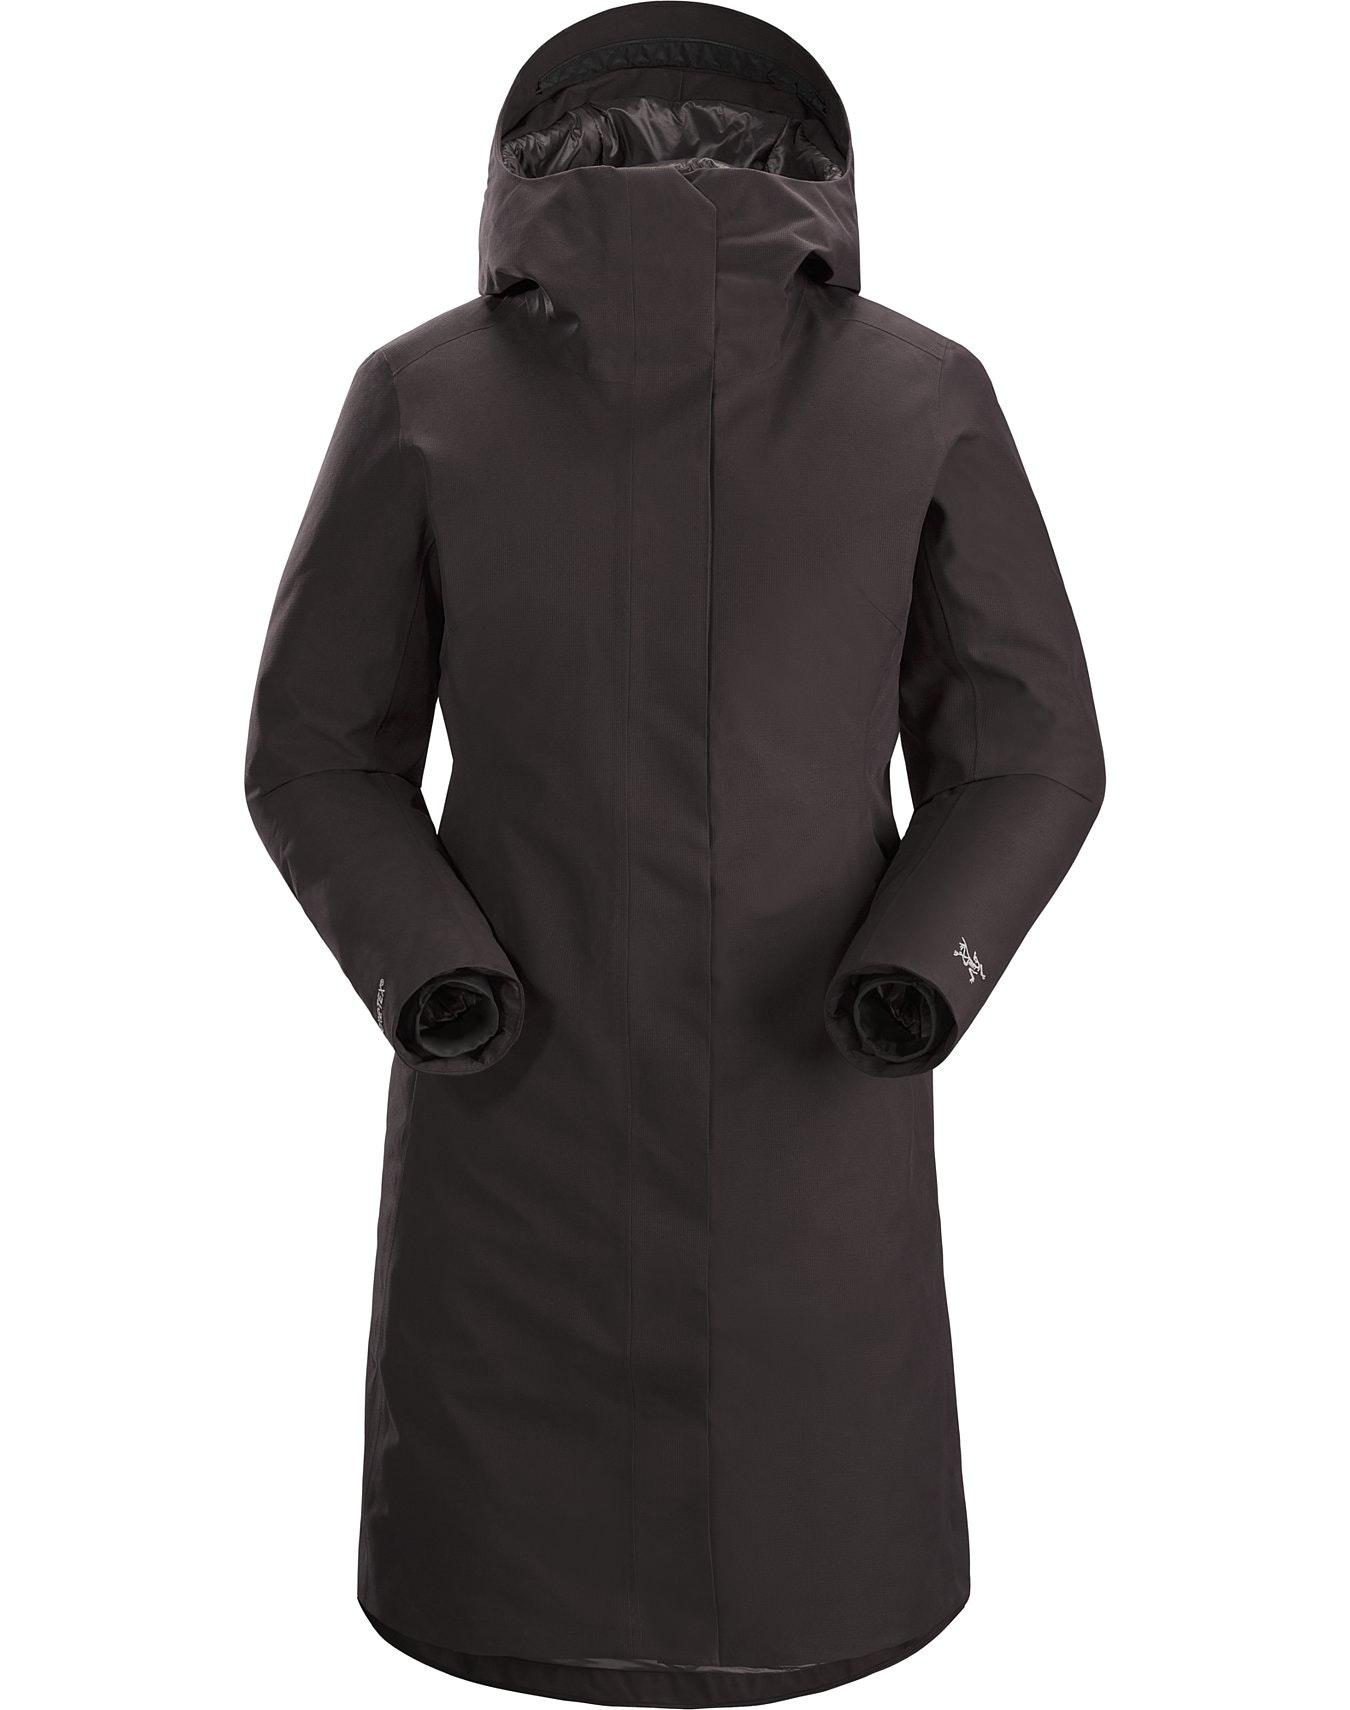 Parka Long Winter Jackets